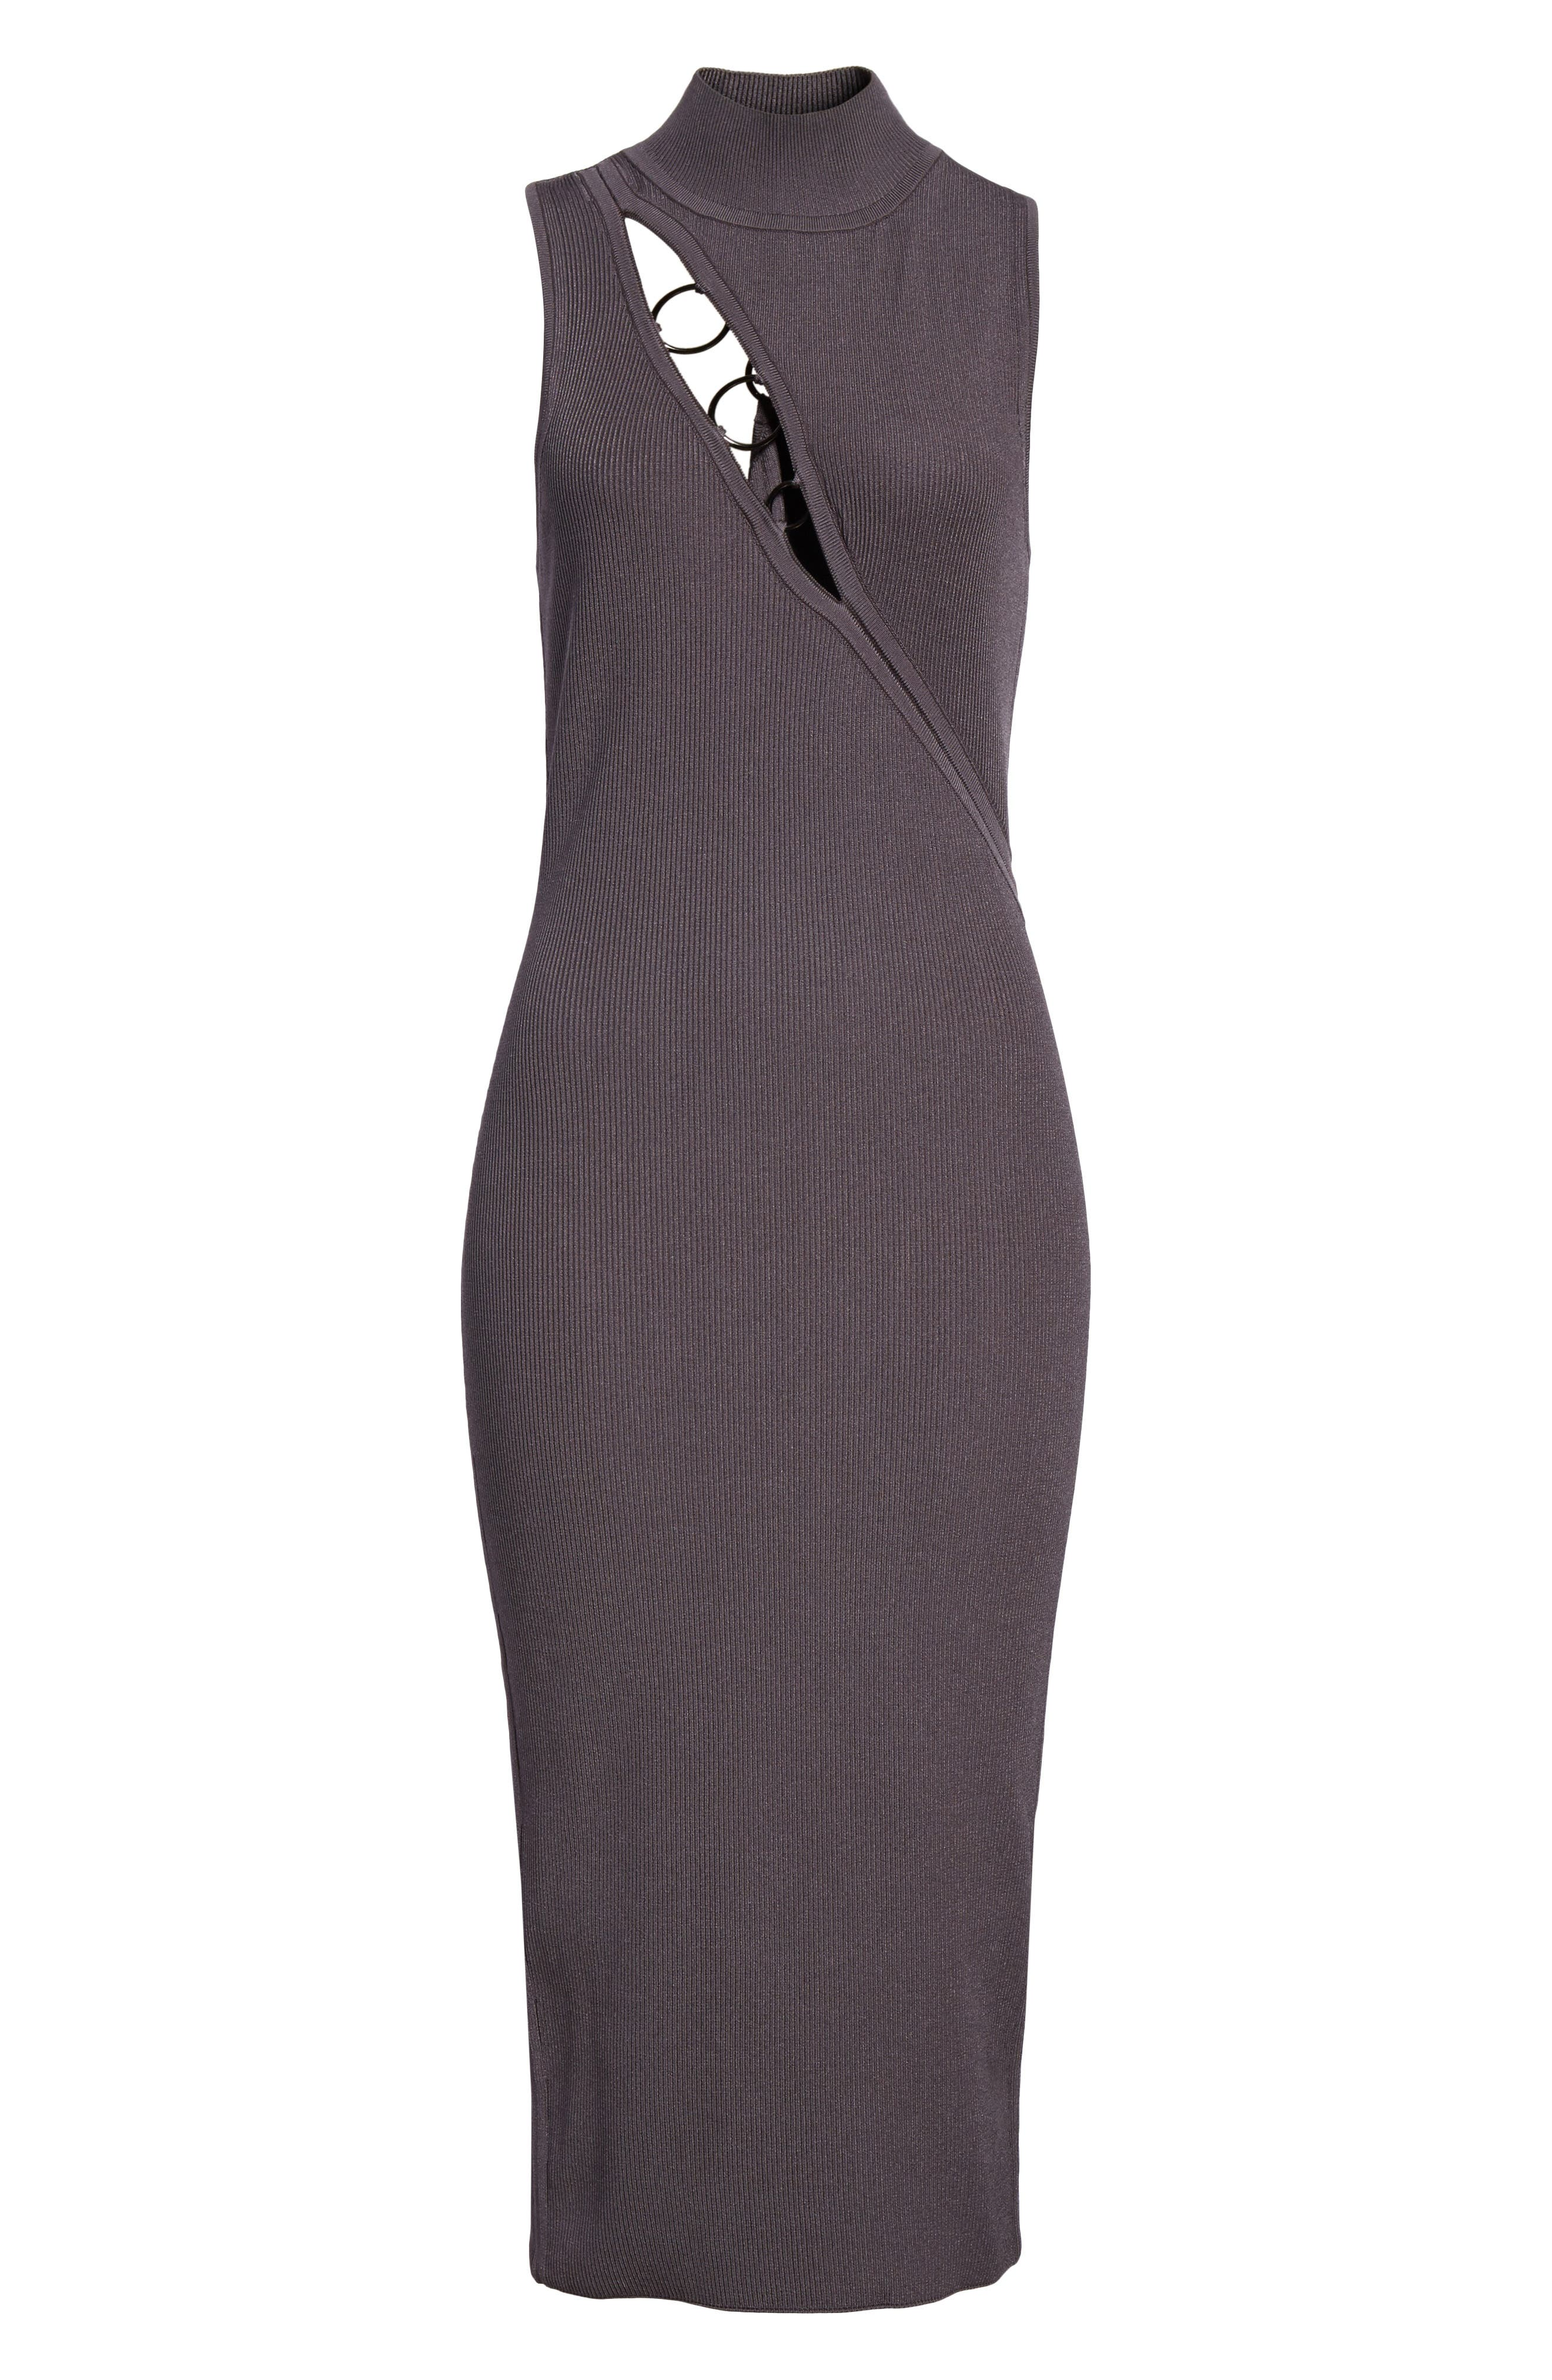 Alsia Cutout Knit Dress,                             Alternate thumbnail 7, color,                             028